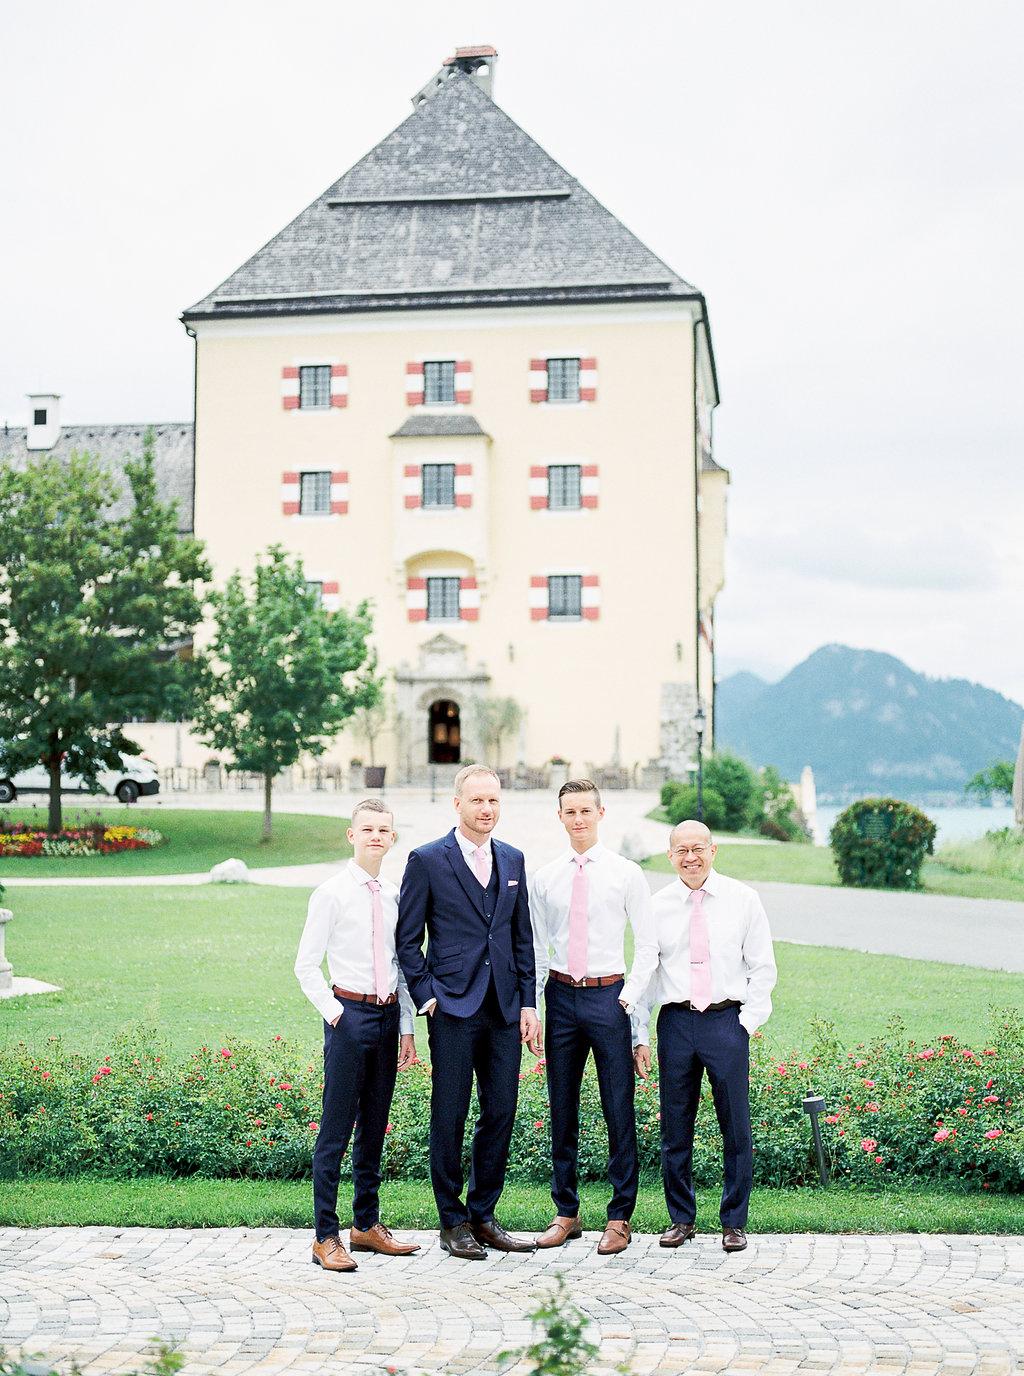 Luxe Navy and Pink Wedding at Schloss Fuschl in Austria by Tanja Kibogo4.JPG